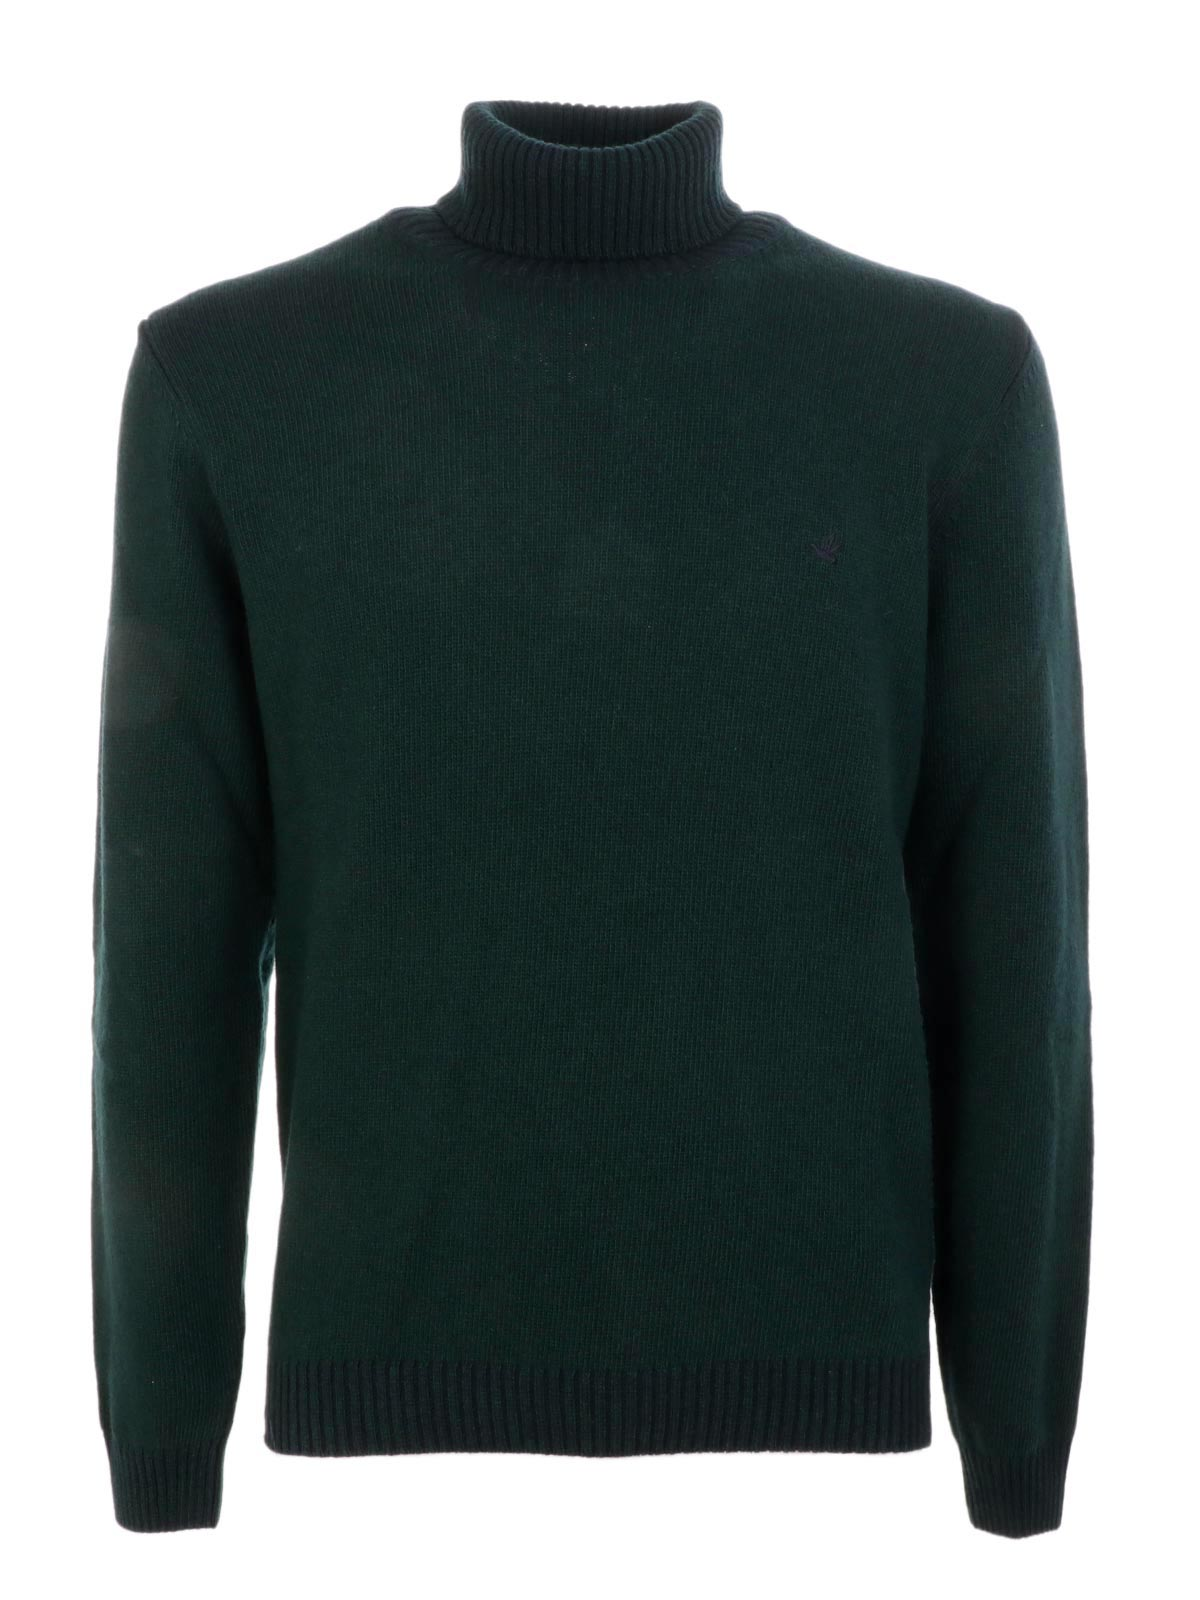 Picture of BROOKSFIELD | Men's Wool Turtleneck Sweater